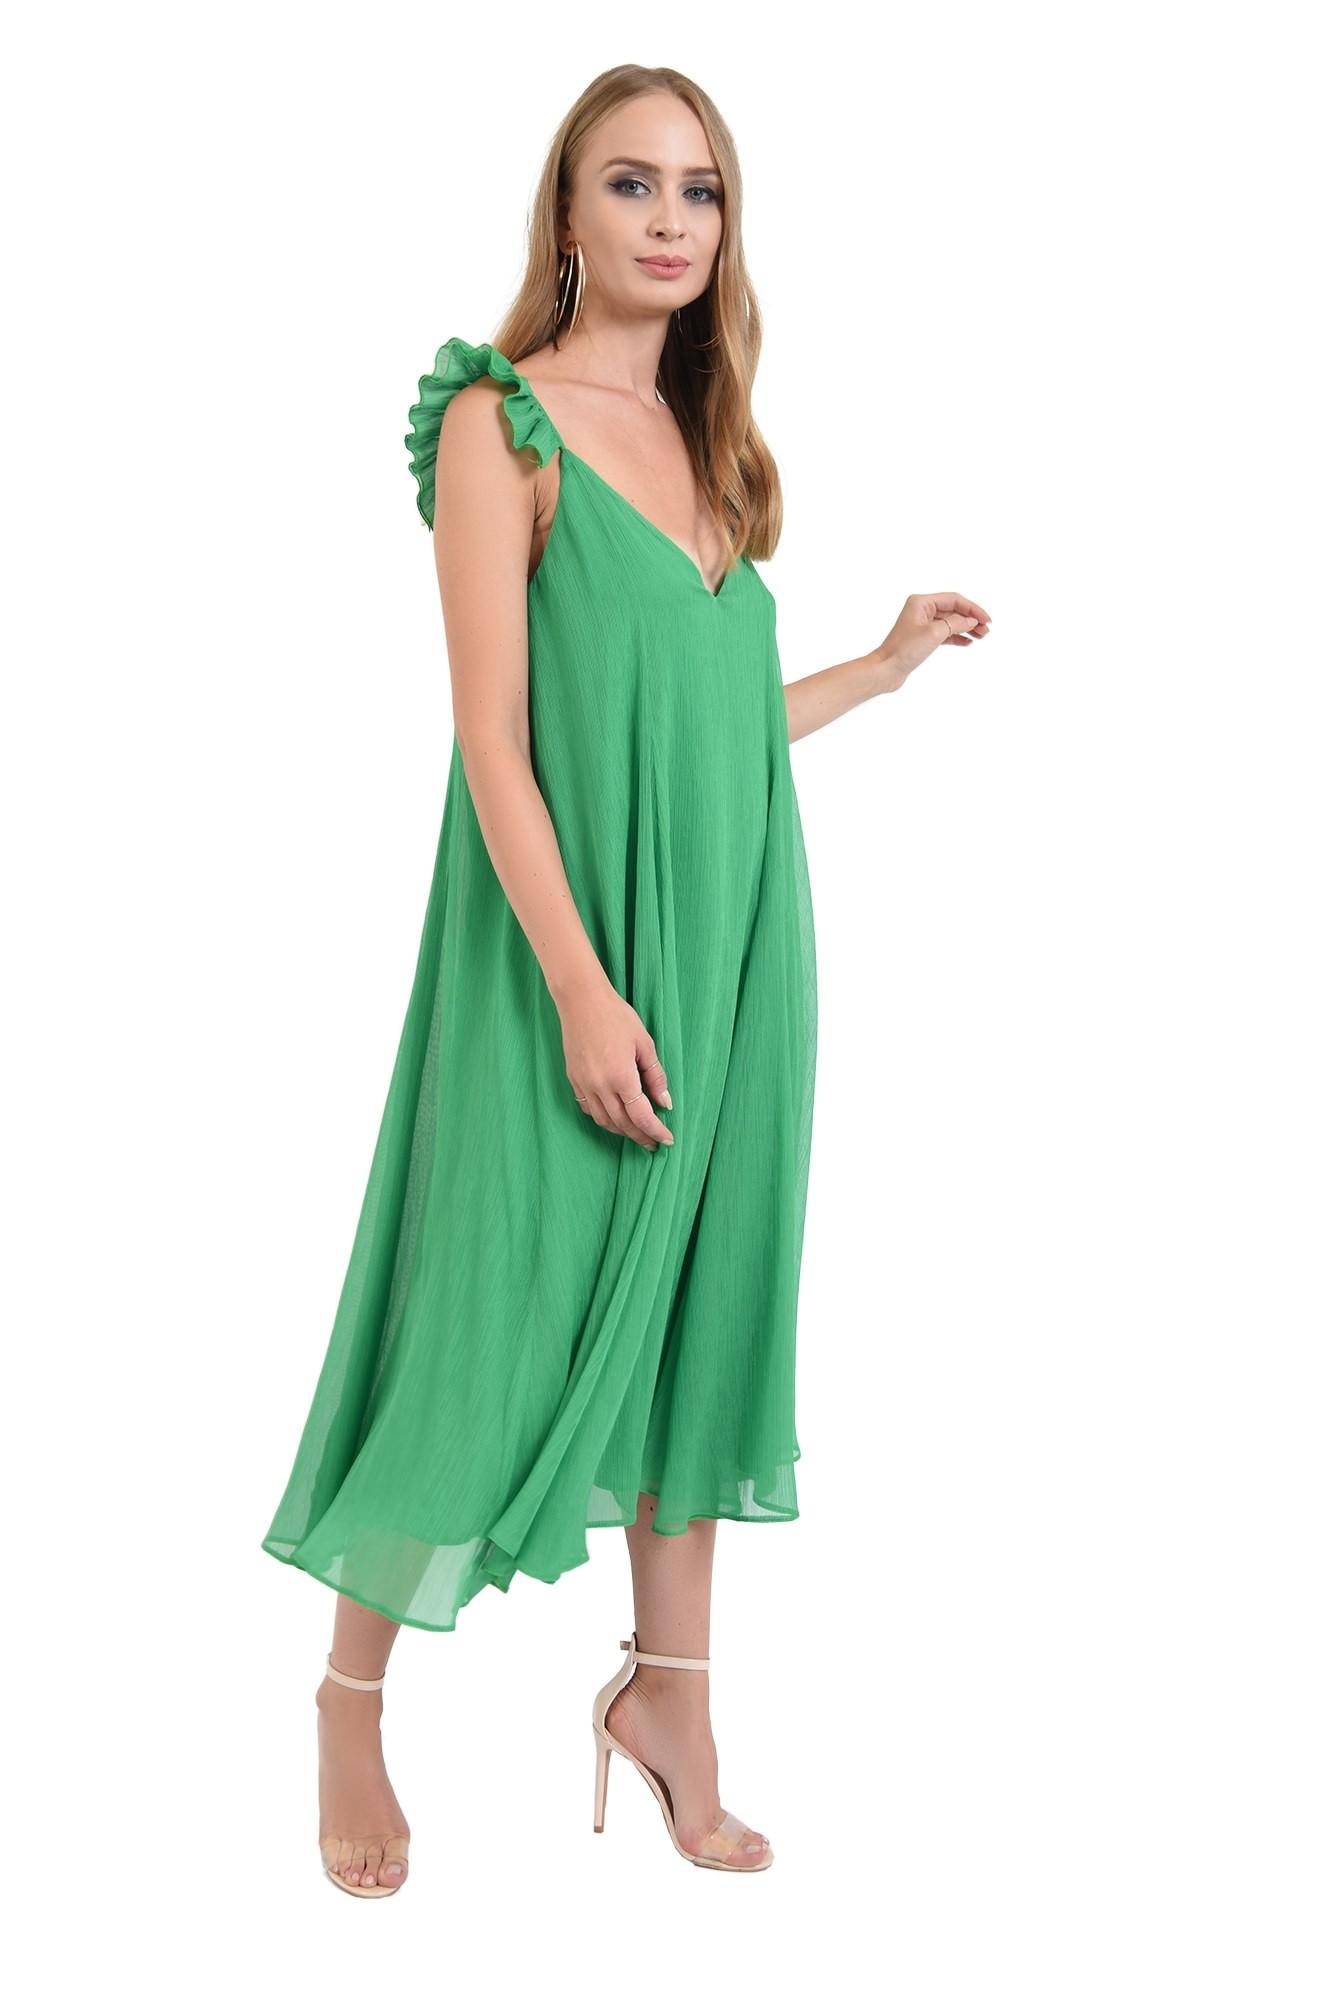 0 - rochie lunga, cu anchior, bretele volan, evazata, verde, Poema